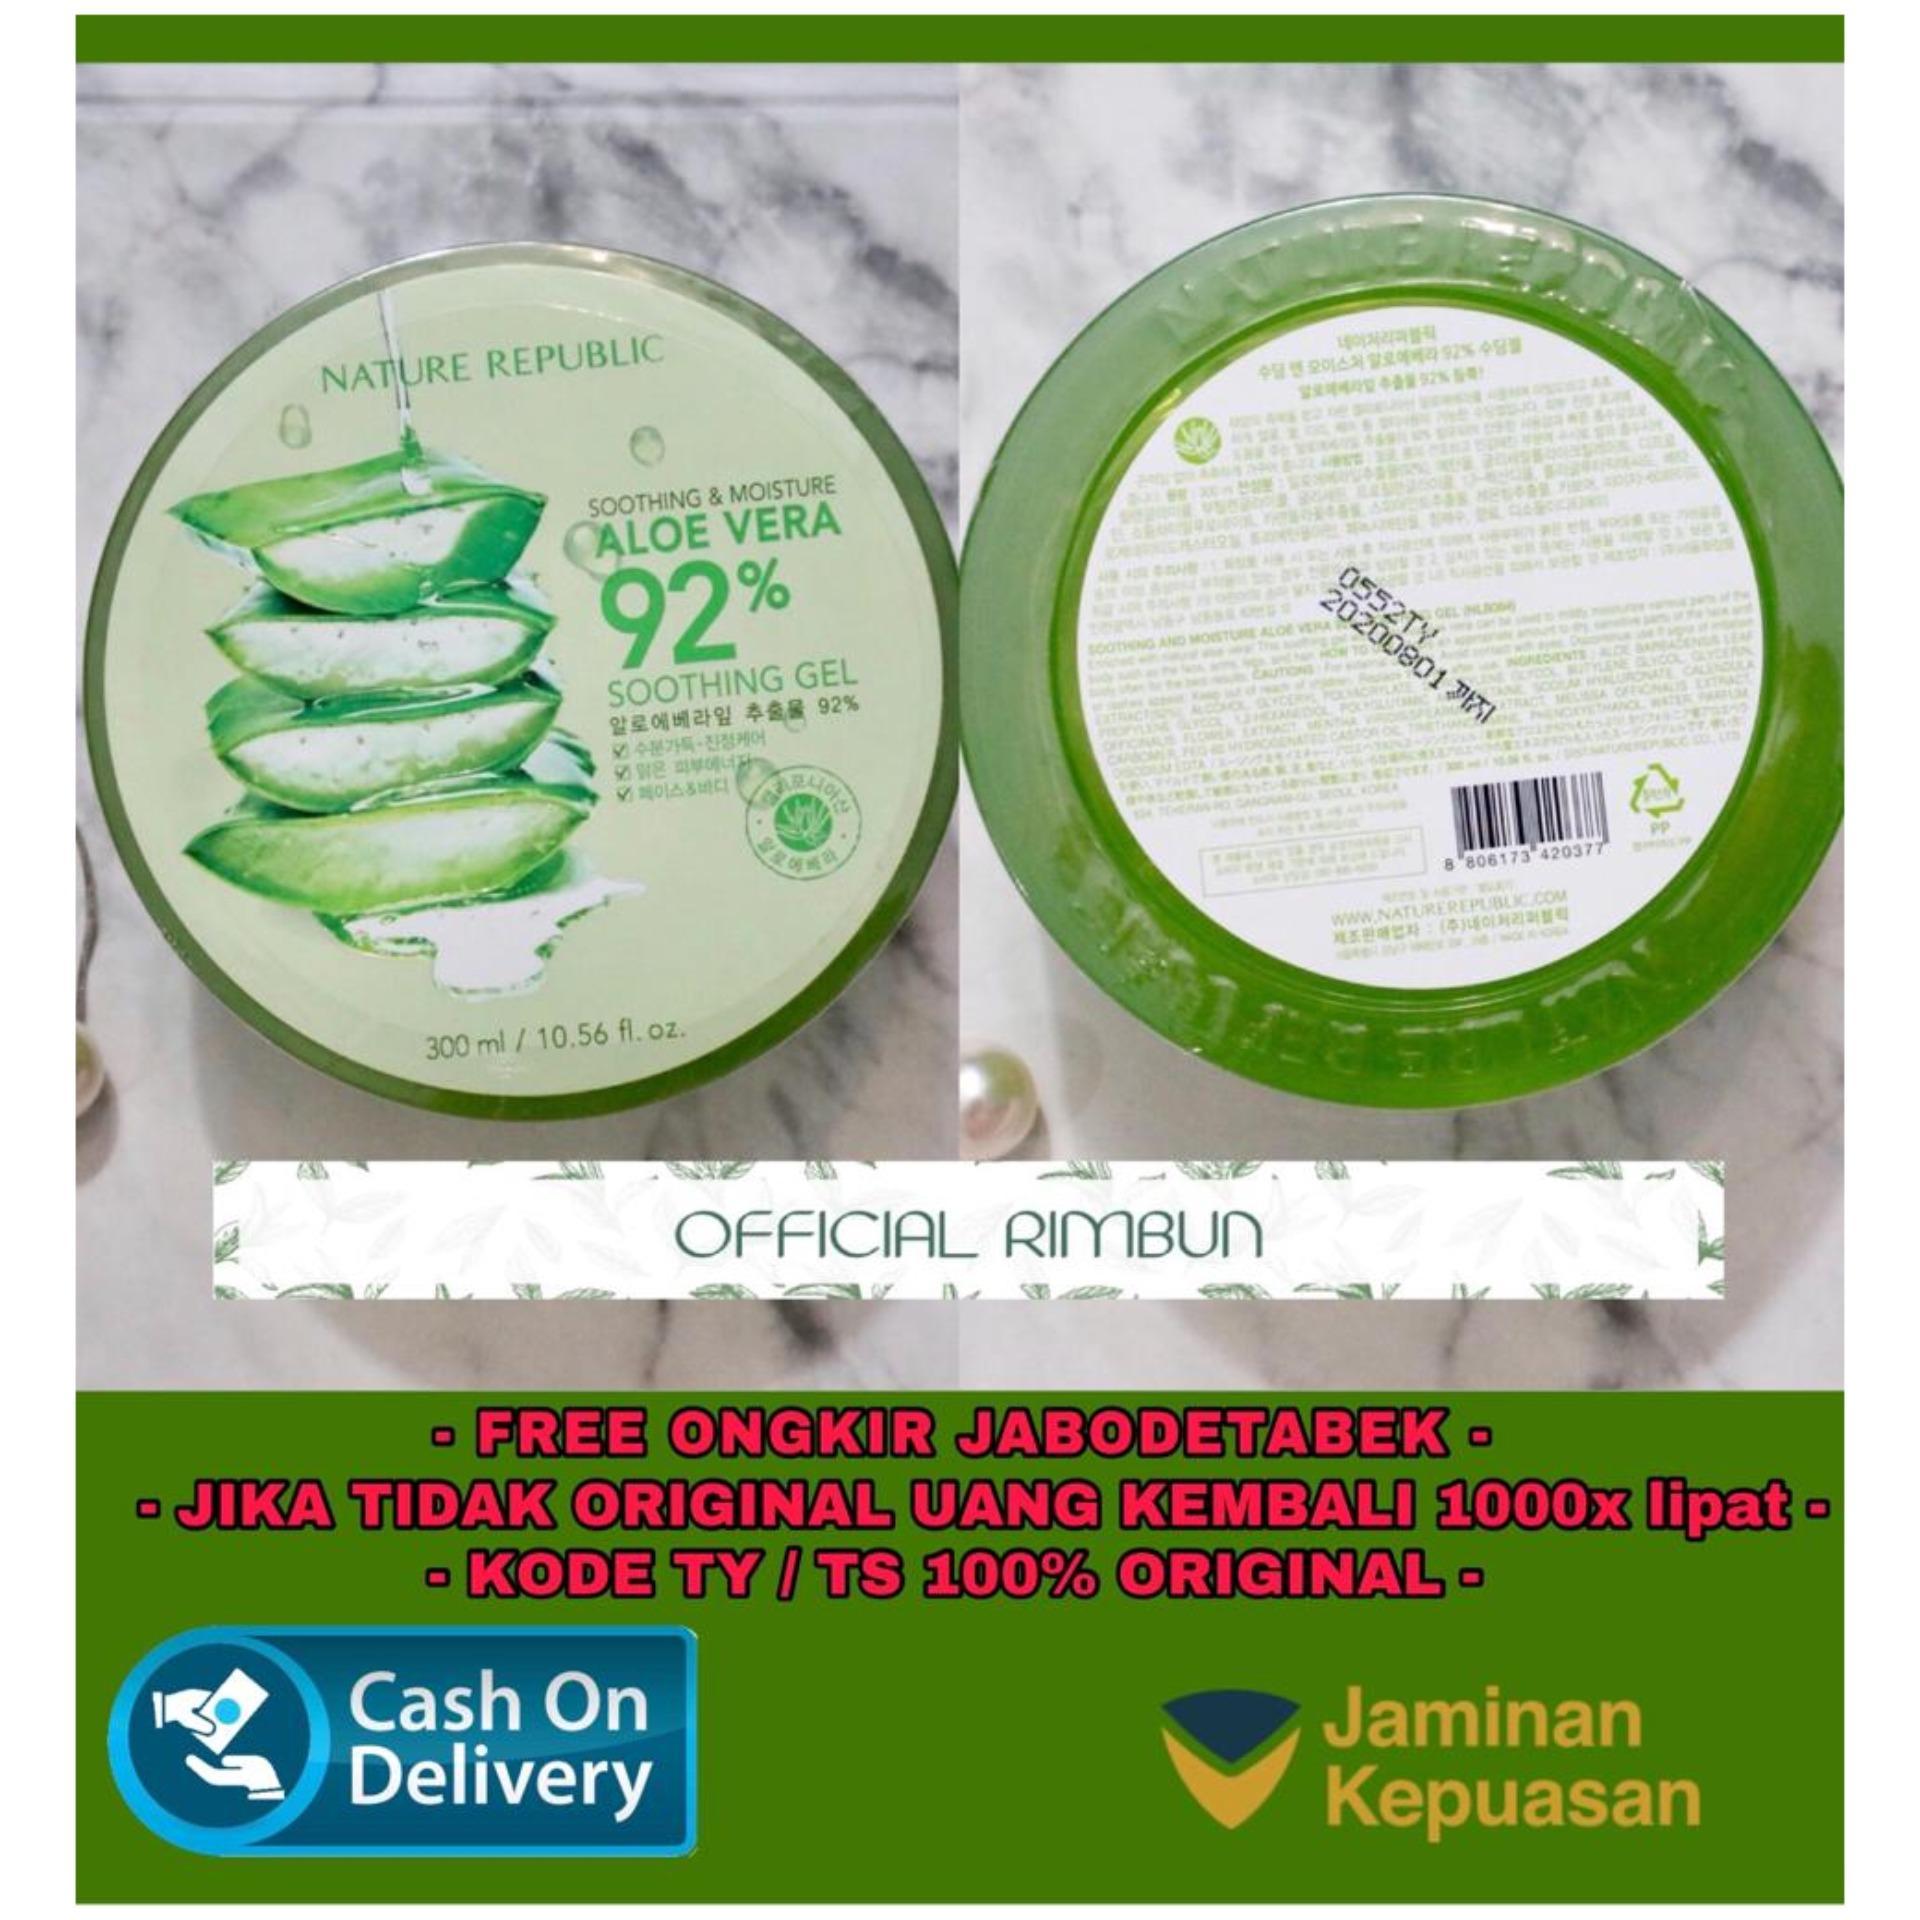 Buy Sell Cheapest Jamieson Aloe Vera Best Quality Product Deals Wardah Hydrating Moisturizer Cream 400 Ml Nature Republic Soothing Moisture 92 Gel 300ml Jaminan Original 100